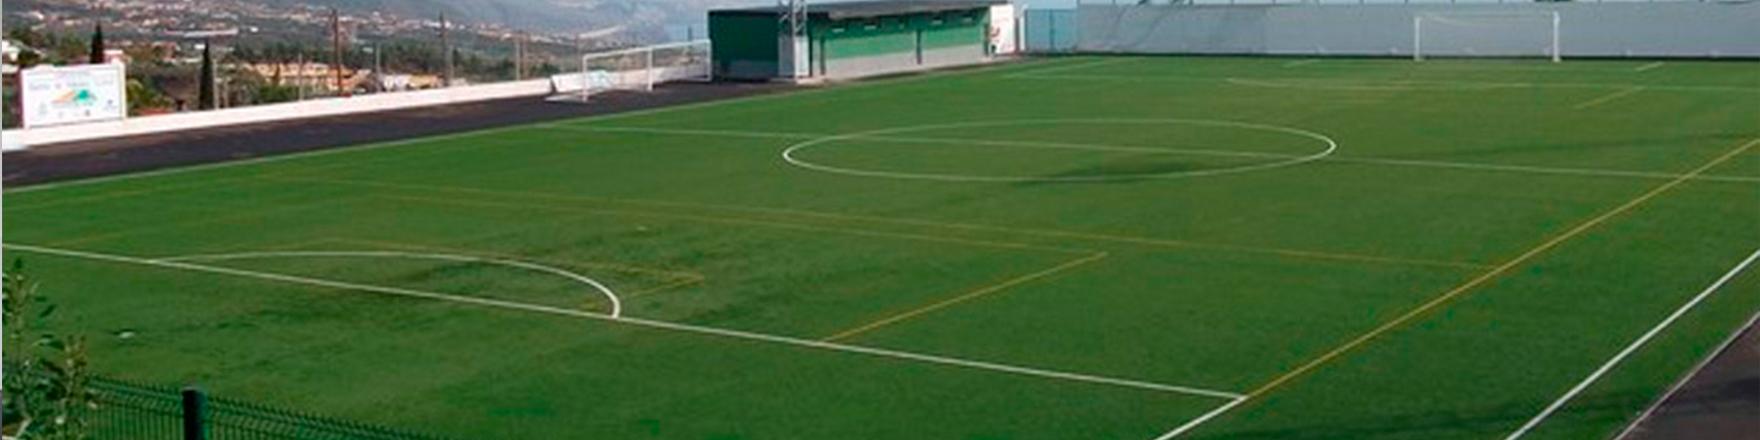 futbol bg seccion 1